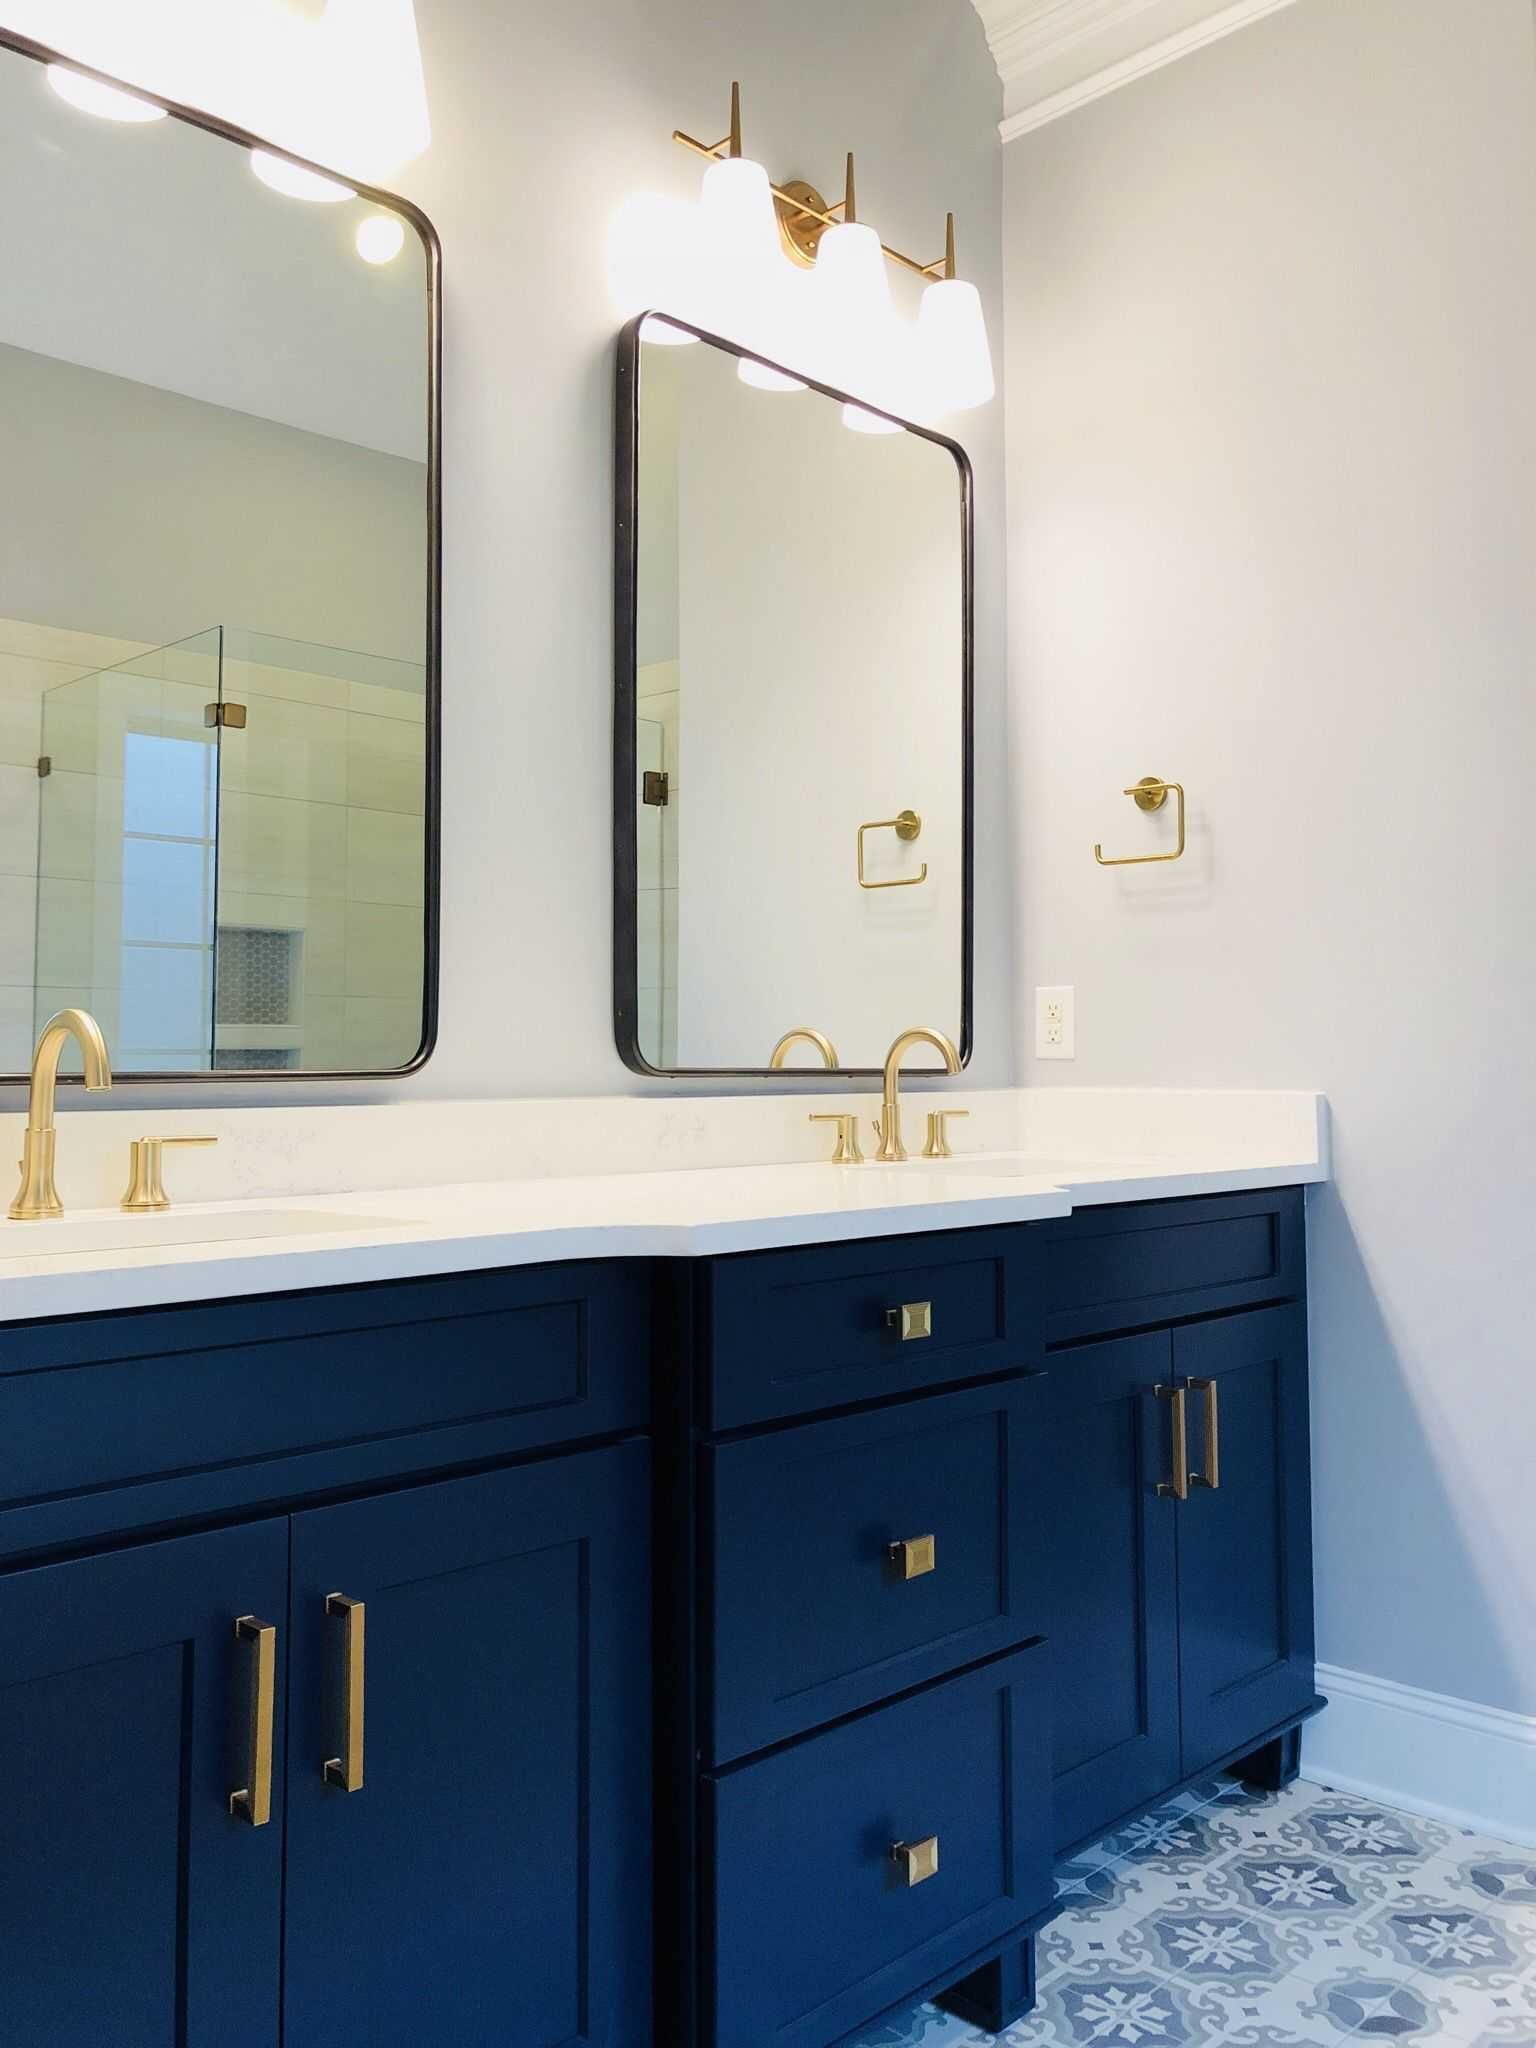 24 Luxury Vanity Mirror With Lights Ideas Manlikemarvinsparks Com Bronze Bathroom Light Fixtures Blue Bathroom Vanity Blue Vanity